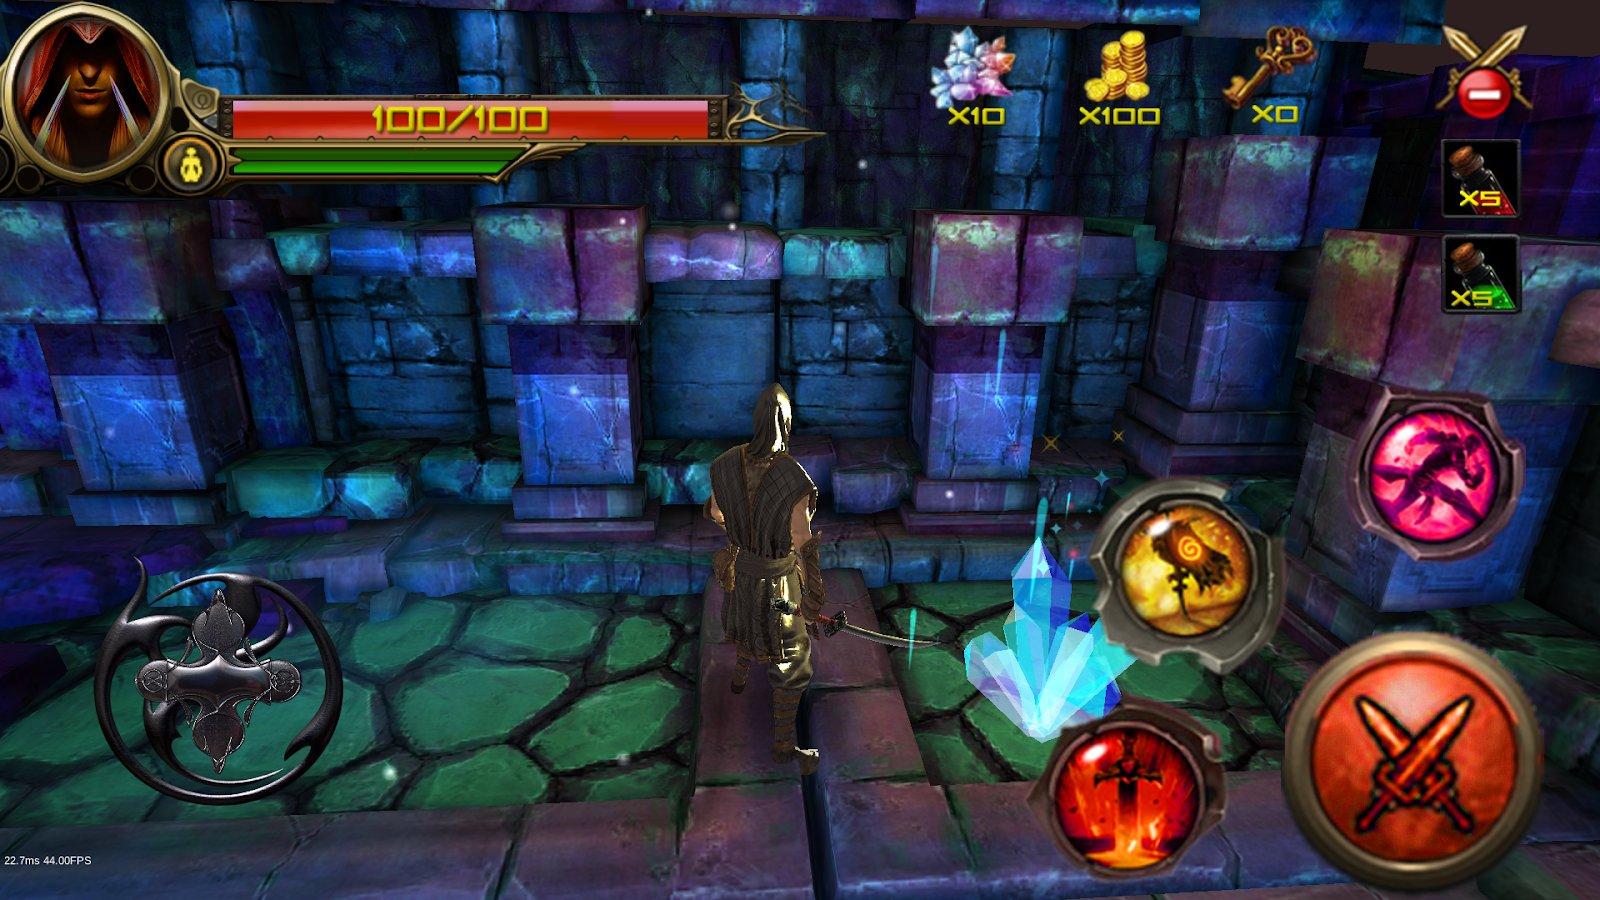 Ninja Warrior - Creed of Ninja Assassins APK Mod